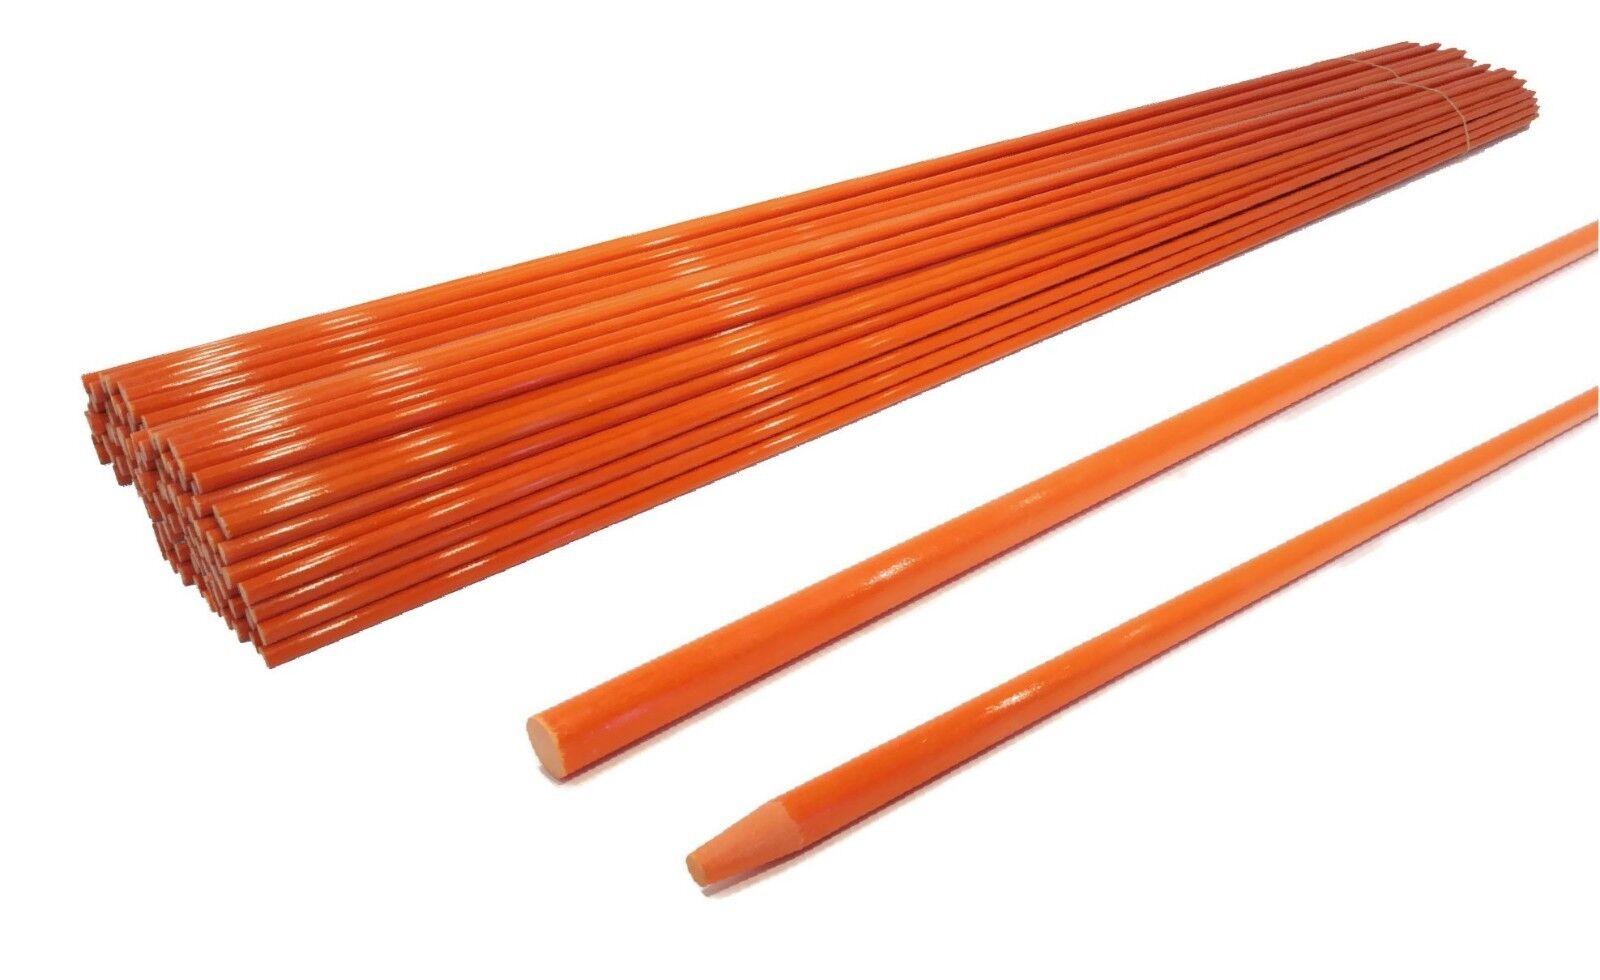 Paquete De 250 vía palos 48 pulgadas de largo, 5 16 Pulgadas, Naranja, Fibra De Vidrio